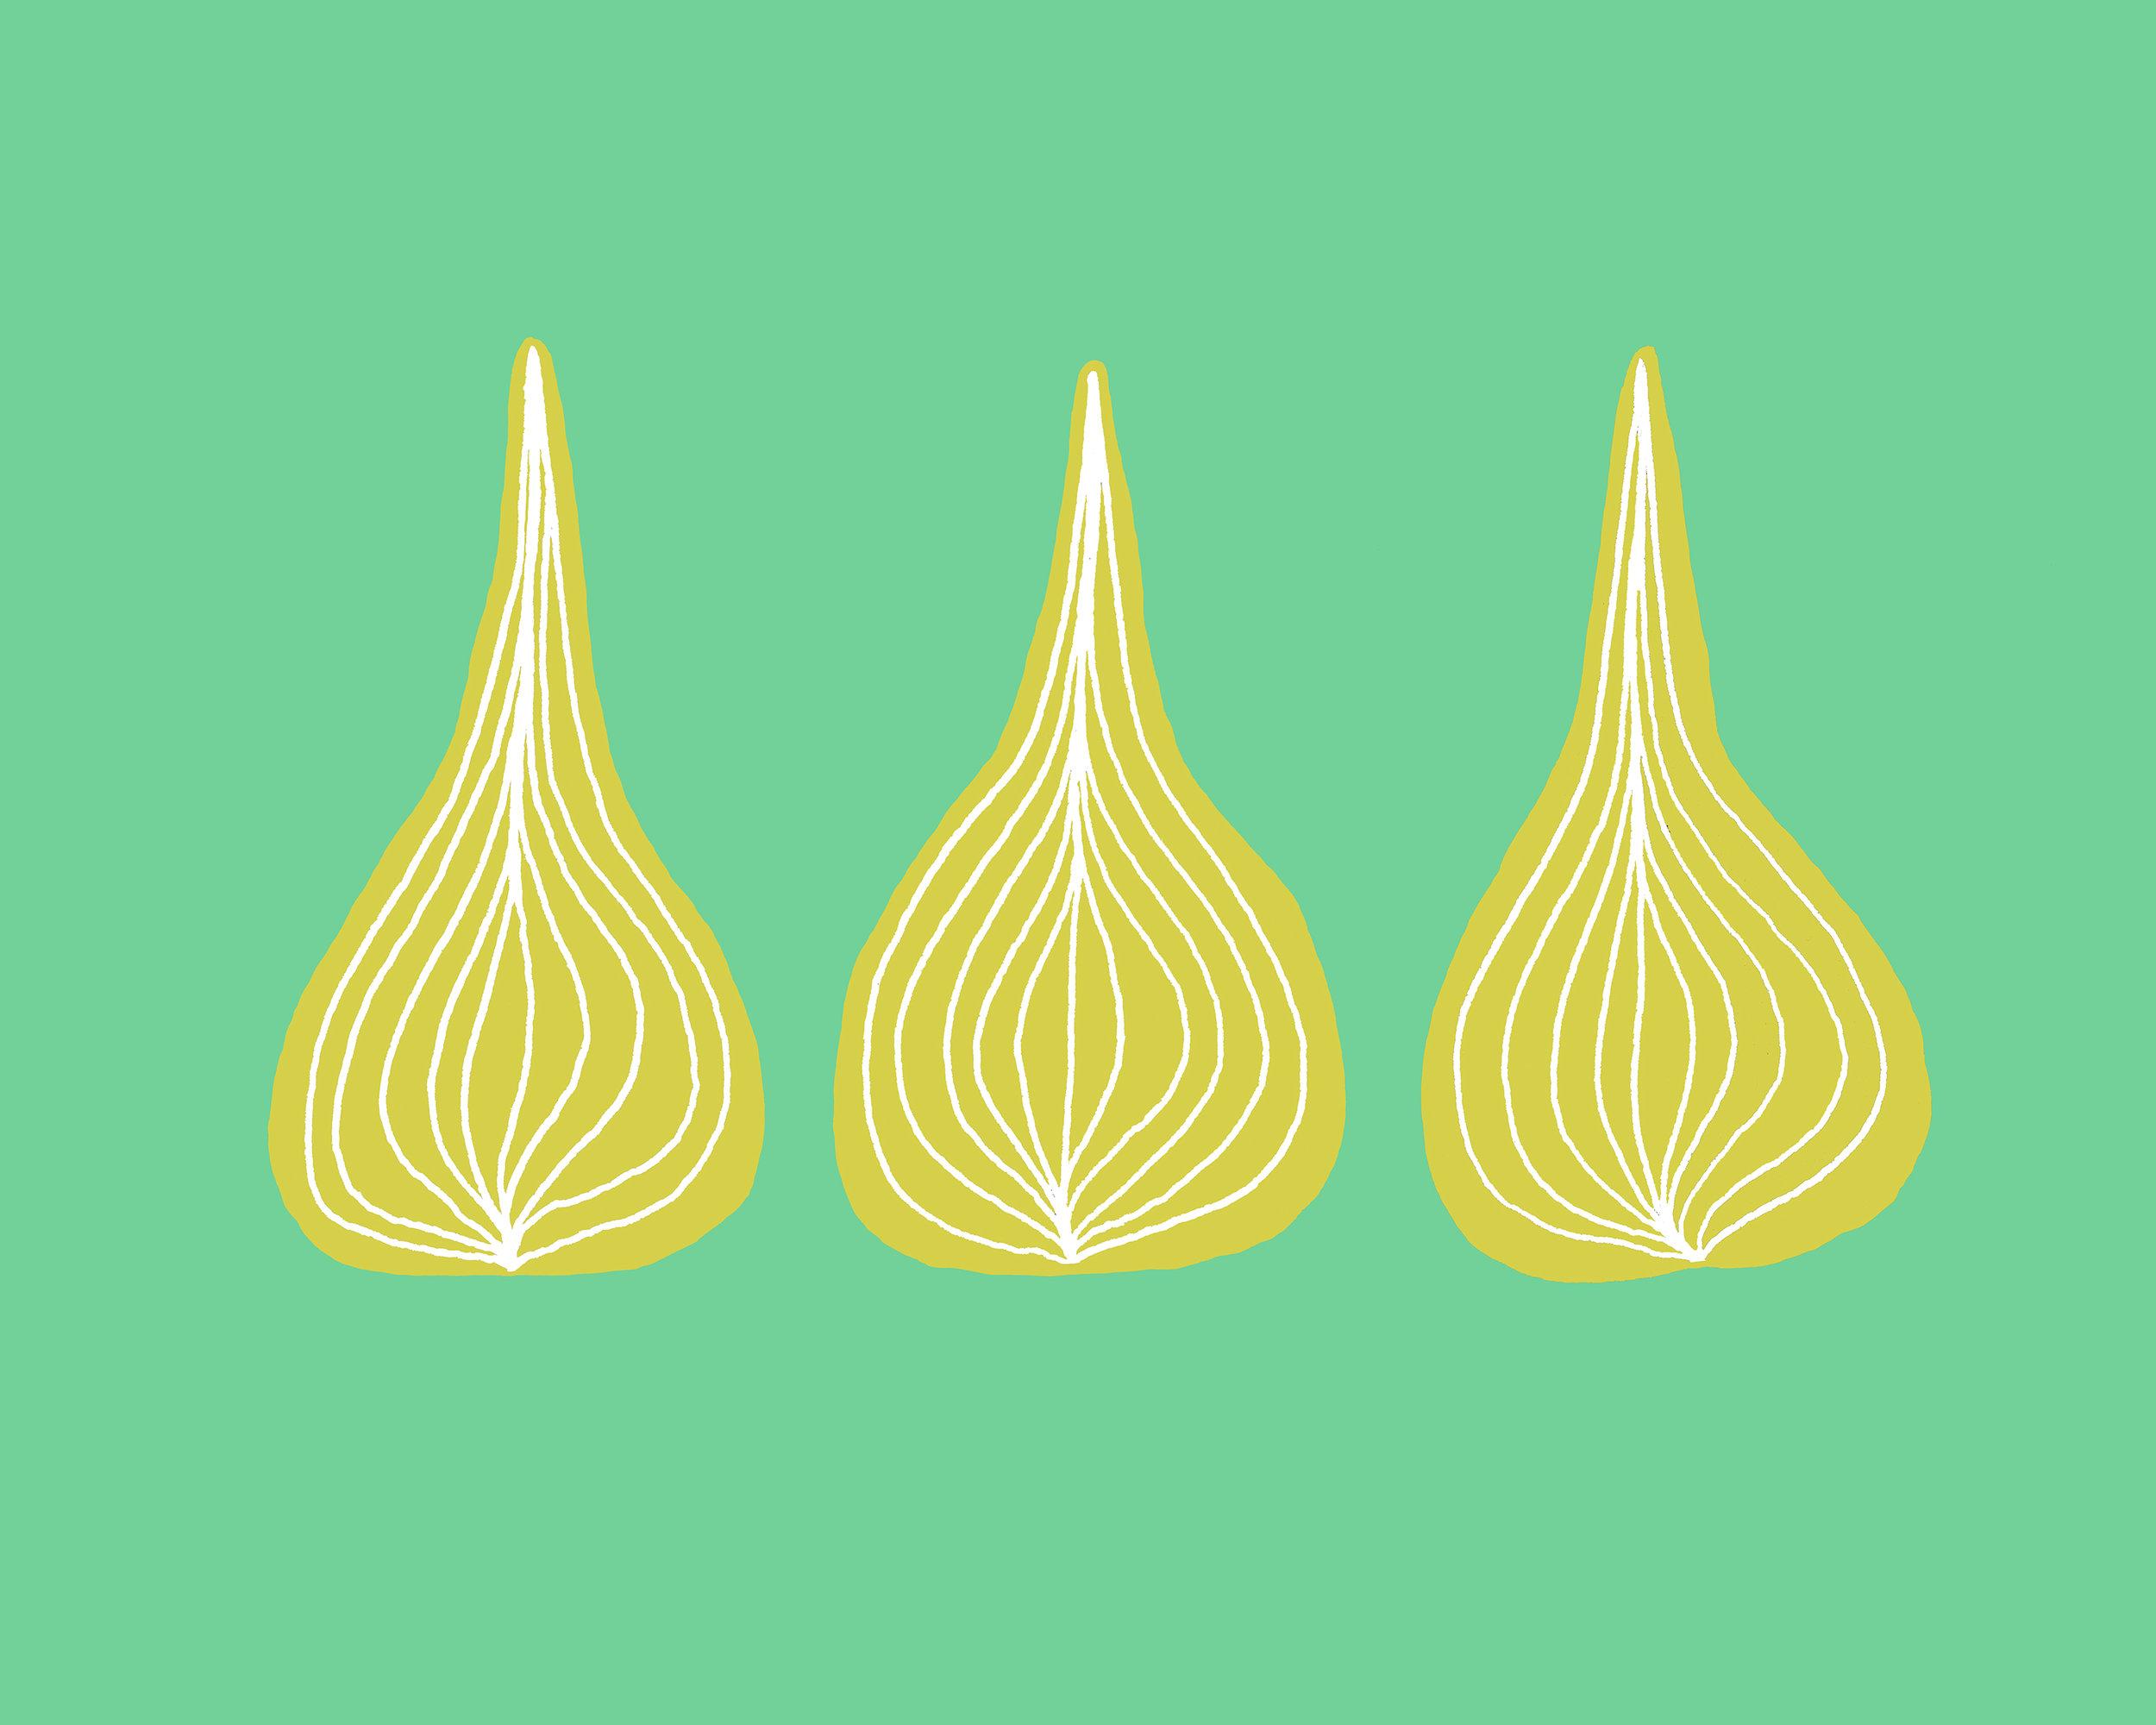 Onions Illustration by Emma Freeman Designs